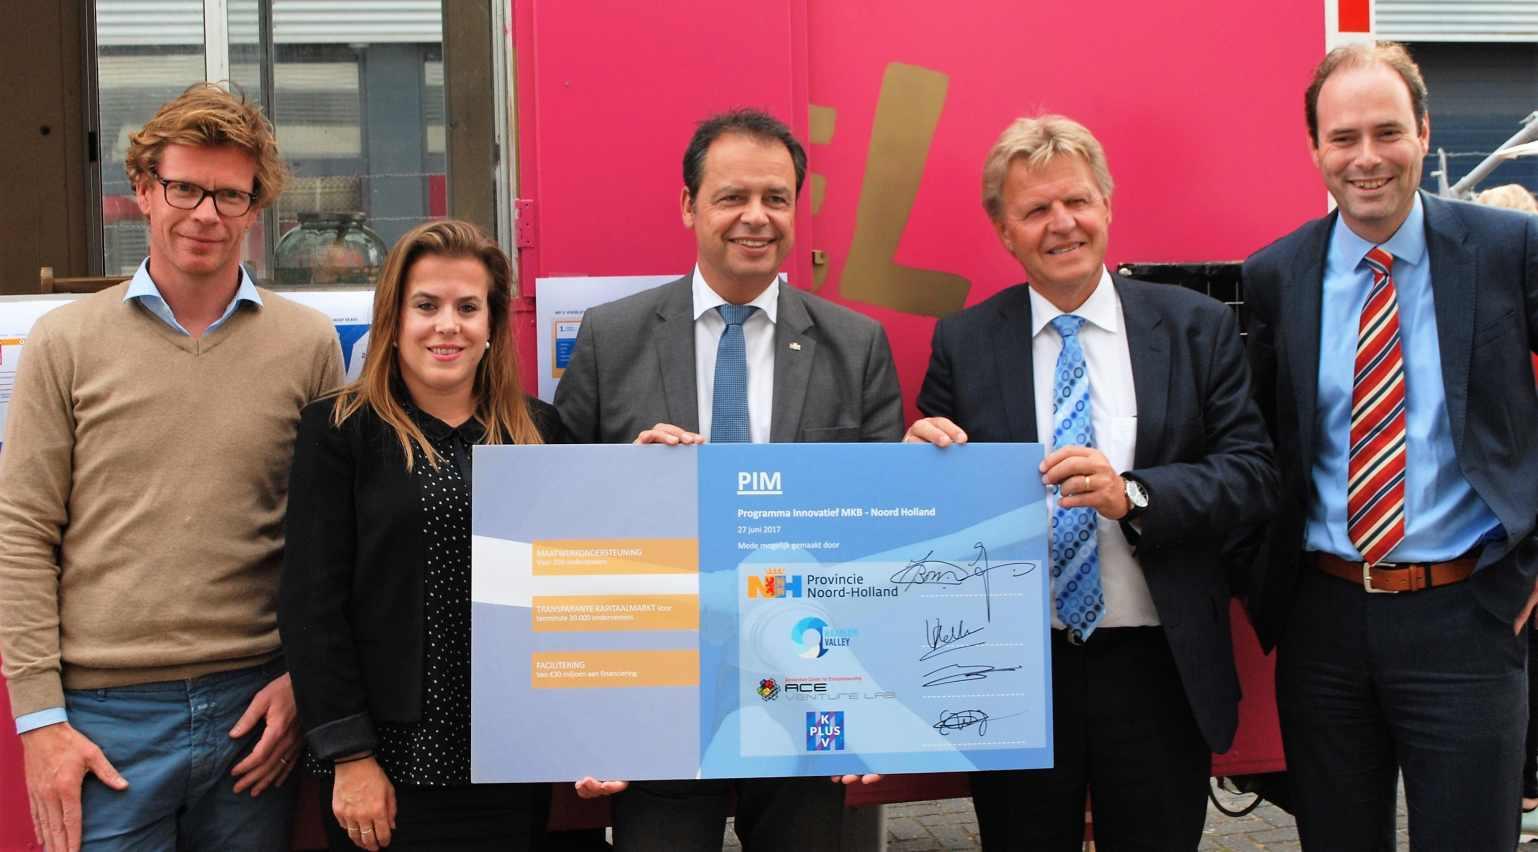 Van Links naar rechts Joost Reimert (ACE) Valerie Vallenduuk (Haarlemvalley) Jack van der Hoek (Gedeputeerde Provincie Noord-Holland) Jaap Bond (Gedeputeerde Provincie Noord-Holland) en Edwin Netjes (KplusV)